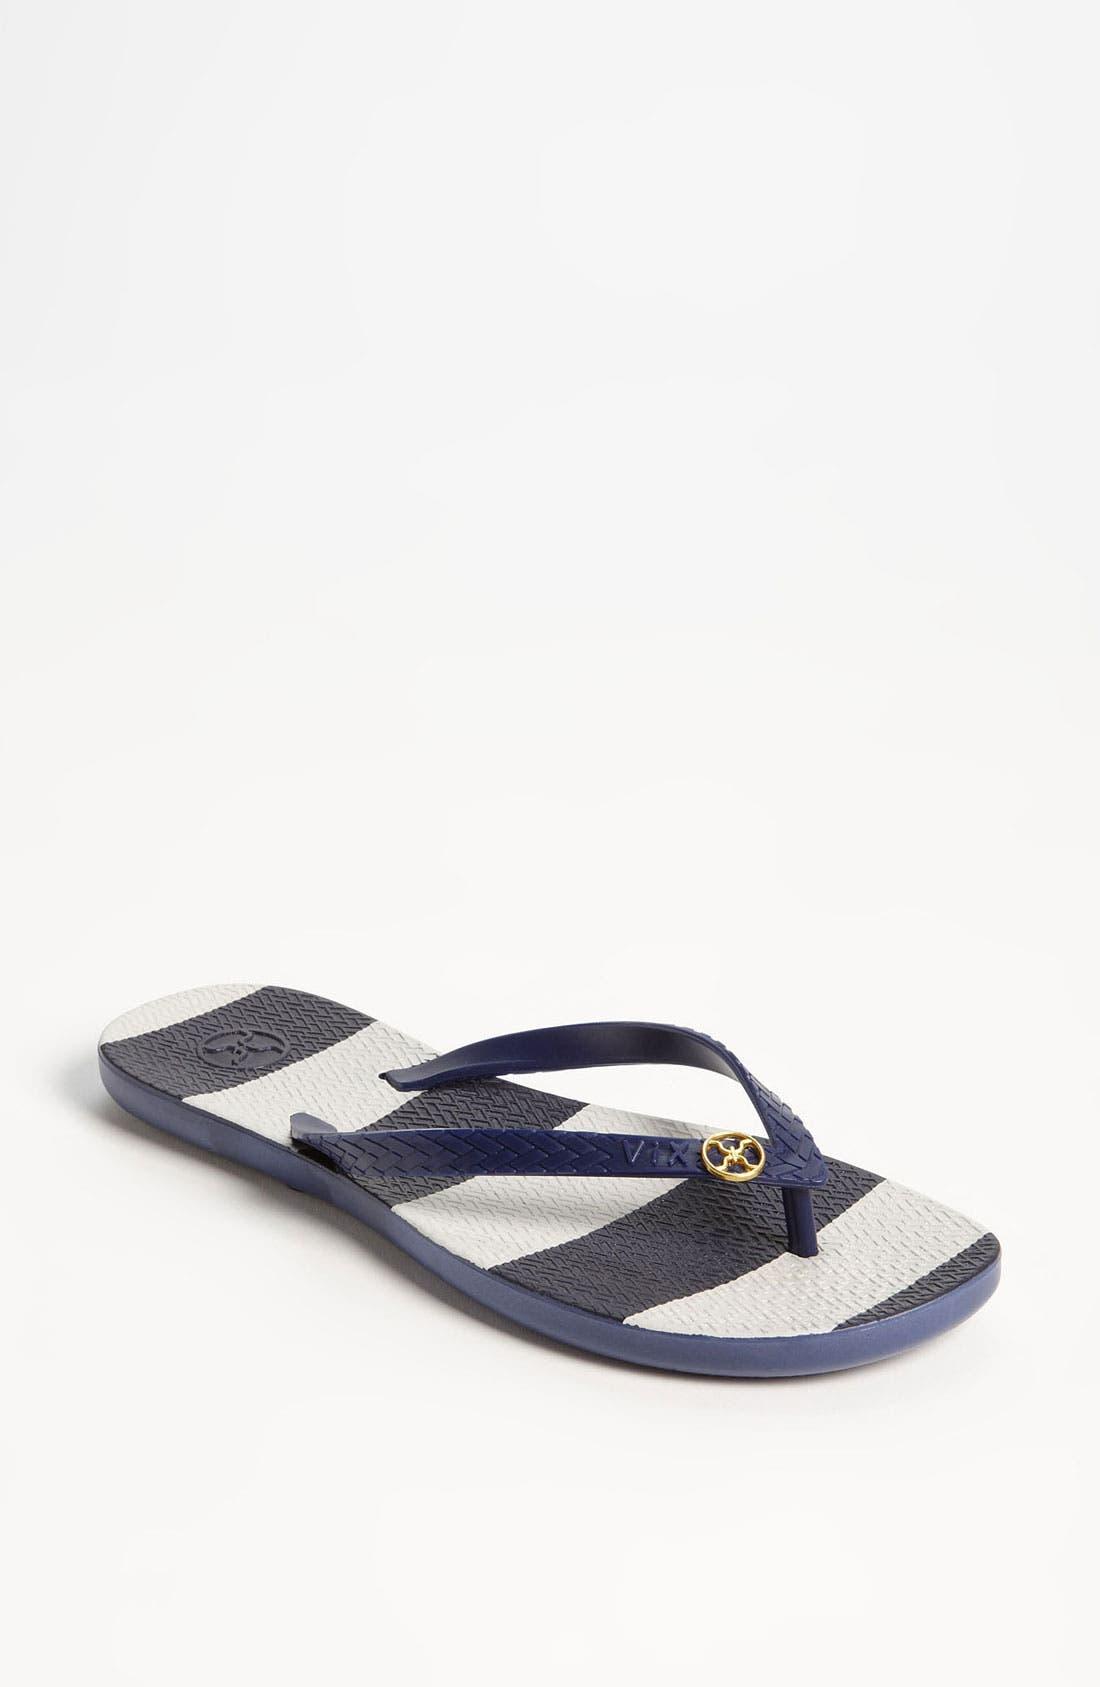 Main Image - ViX Swimwear 'Malawi' Sandal